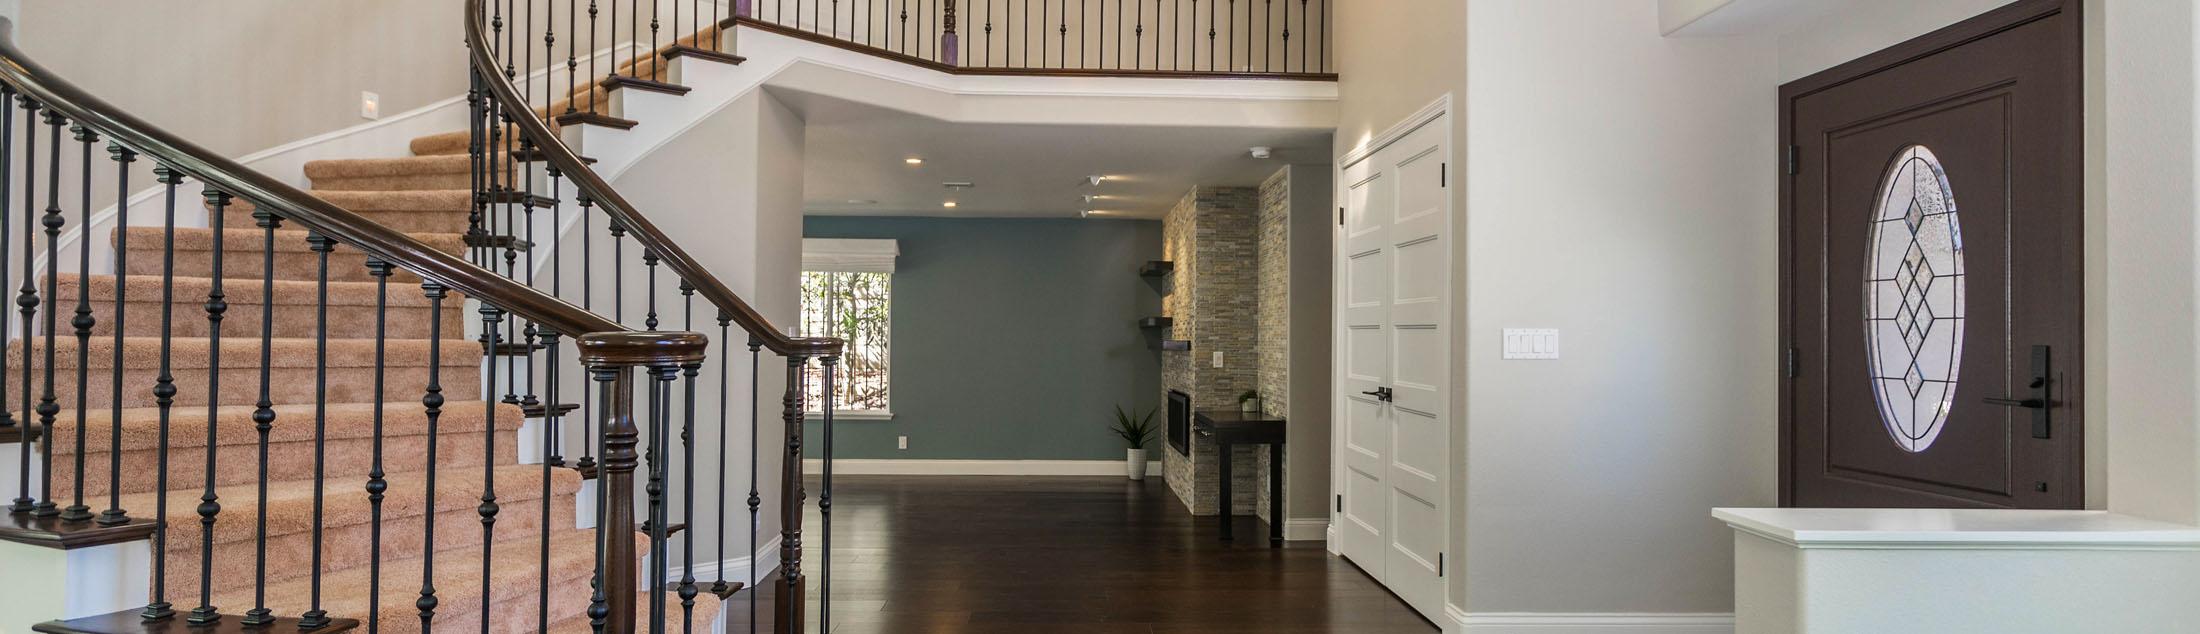 conejo valley home listings